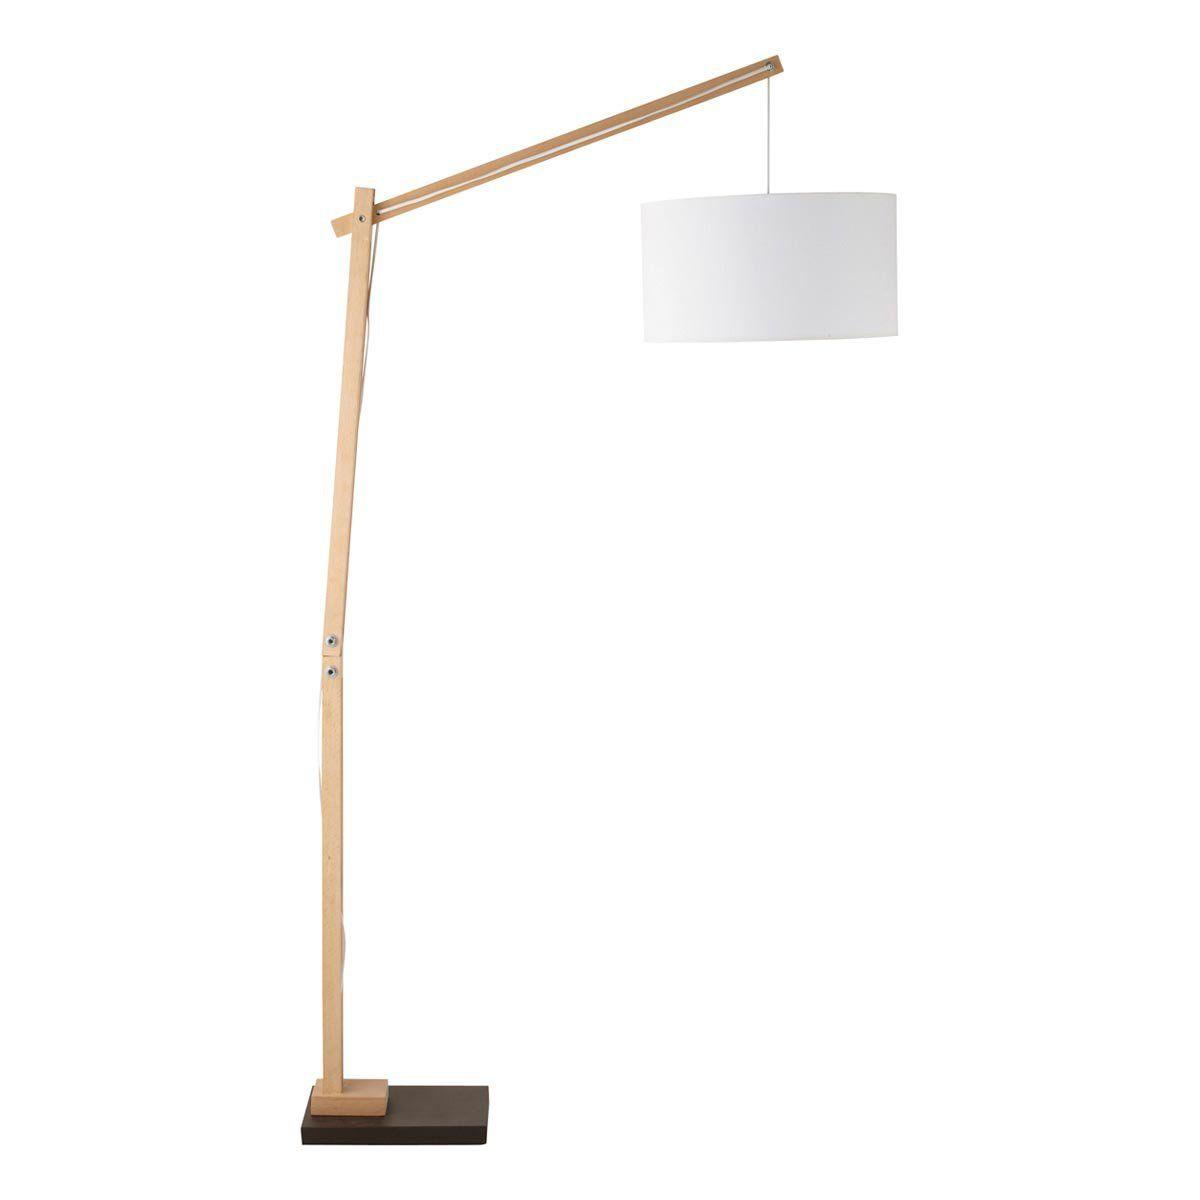 lampadaire bois taiga d sirable pinterest lampadaire lampadaire bois et bois. Black Bedroom Furniture Sets. Home Design Ideas